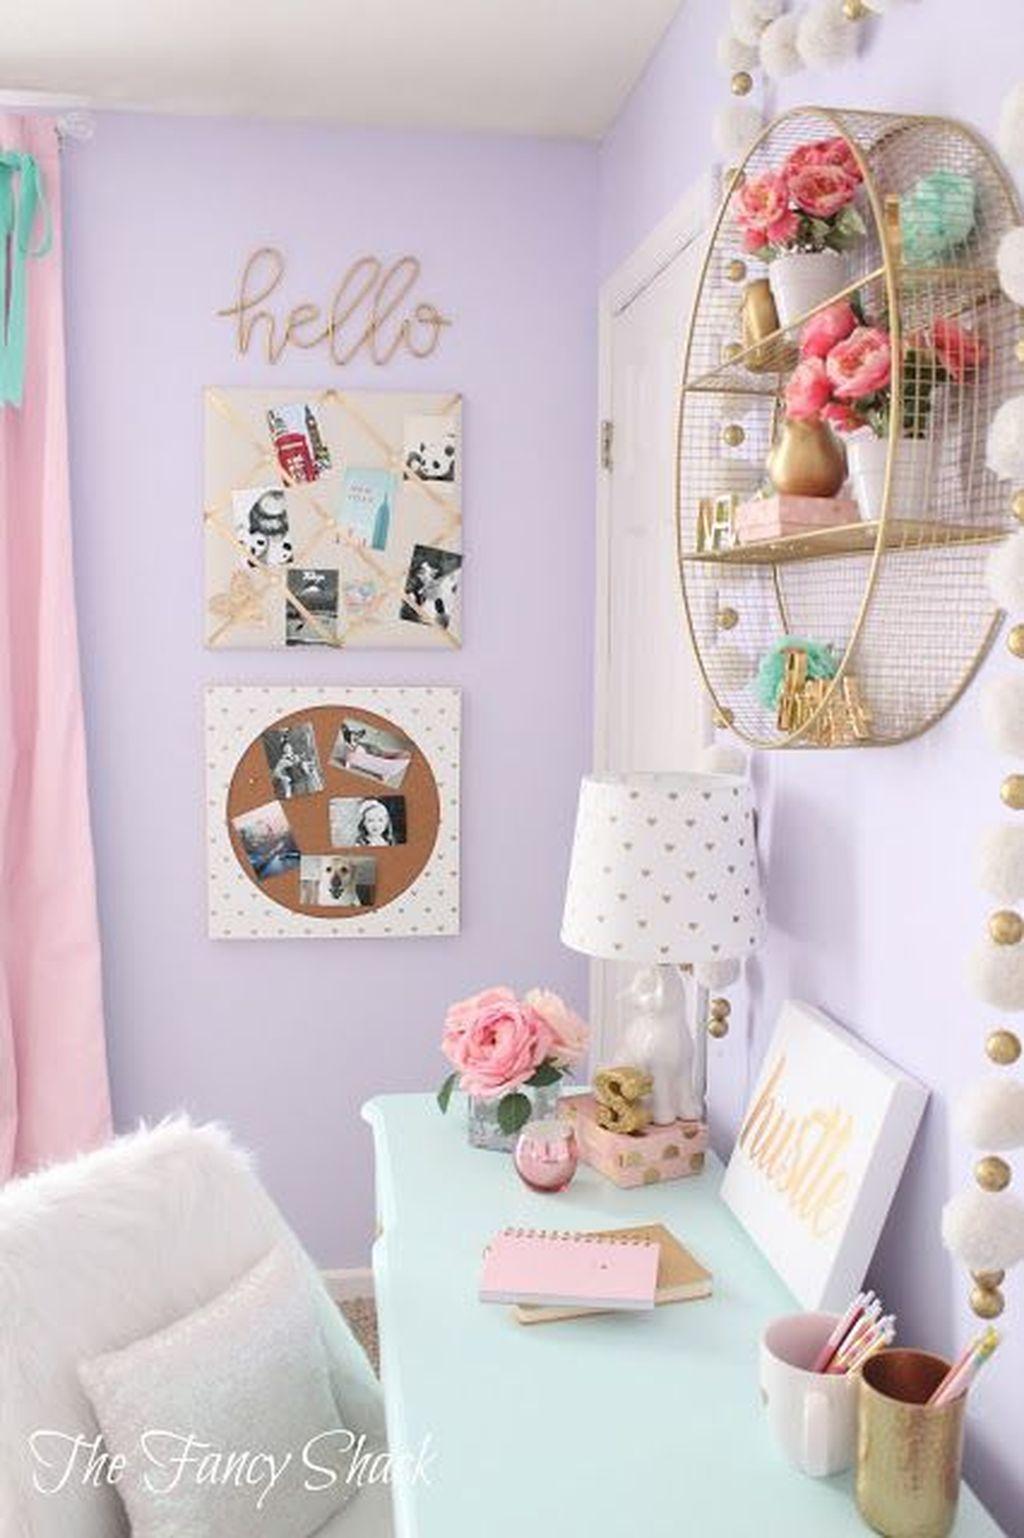 43 Top Diy Room Decor Ideas Suitable For Small Room Bedroom